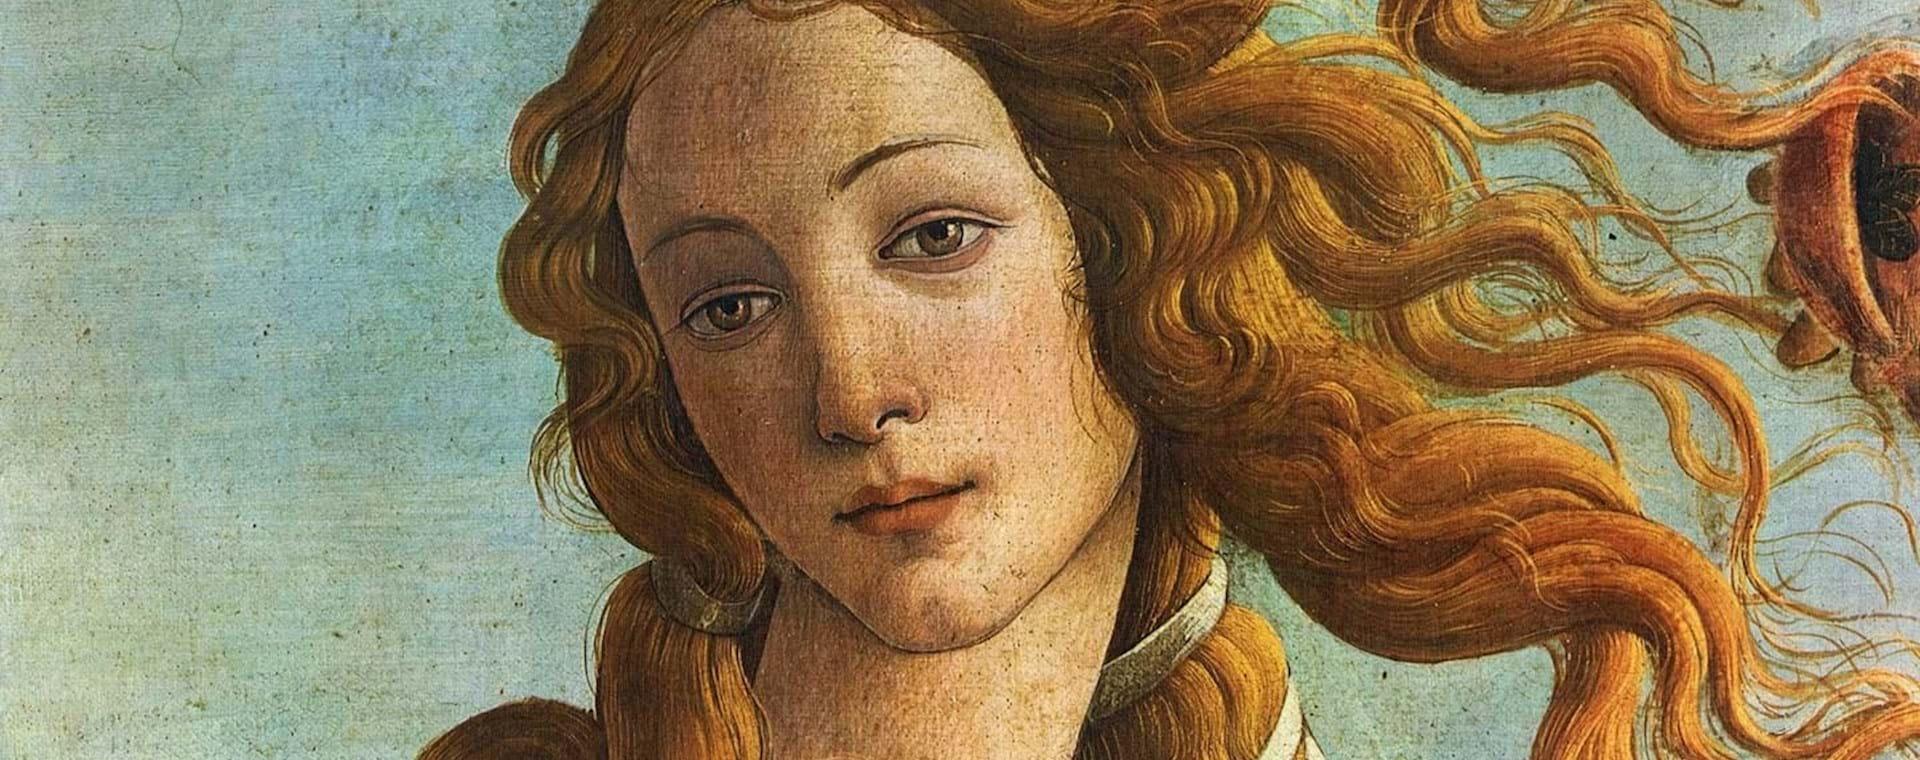 Uffizi Gallery Semi-Private Renaissance Art Tour